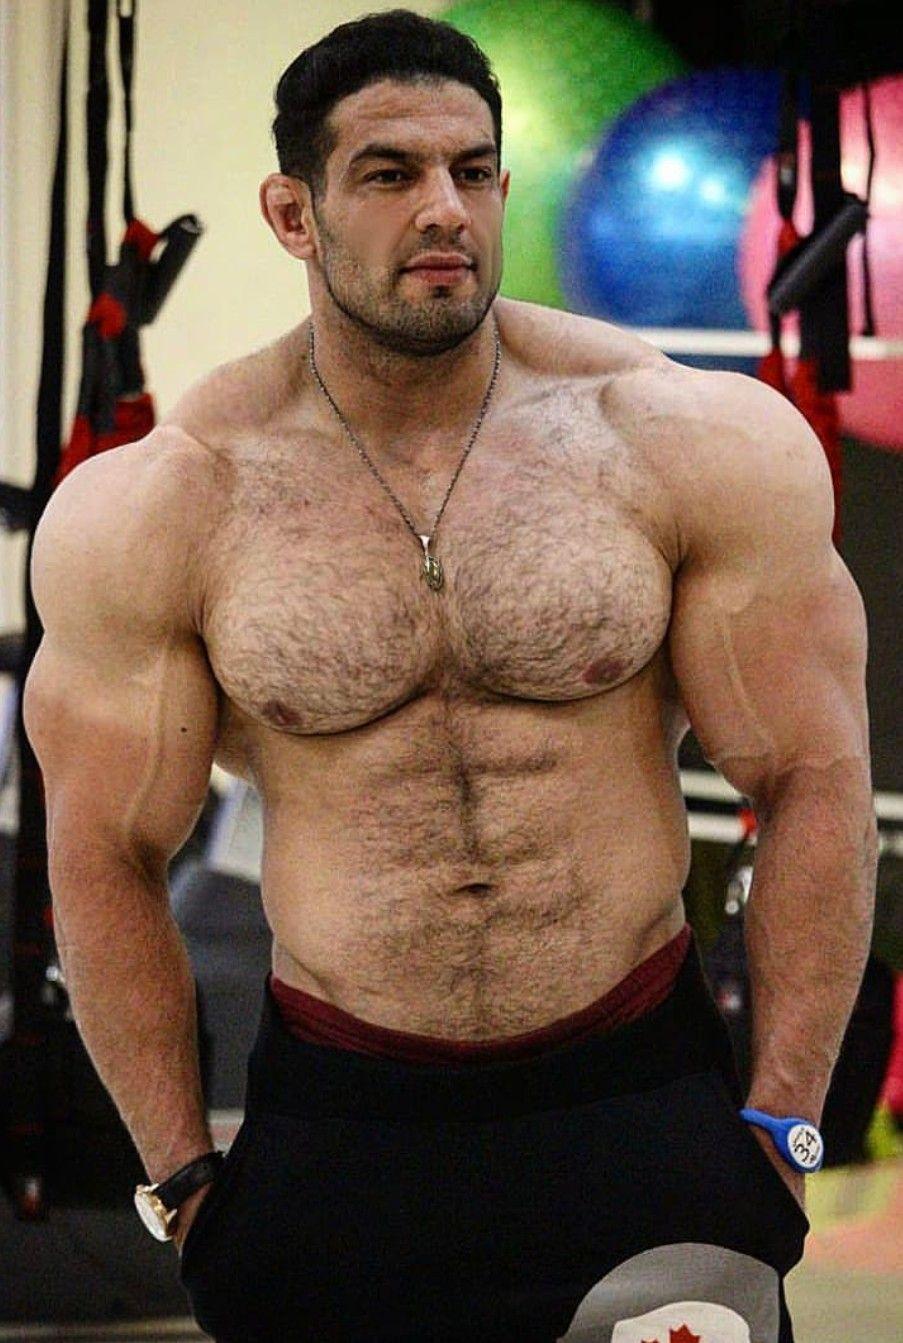 MACHO, ME RECALIENTAS¡¡¡¡ | Muscle men, Men looks, Big guys